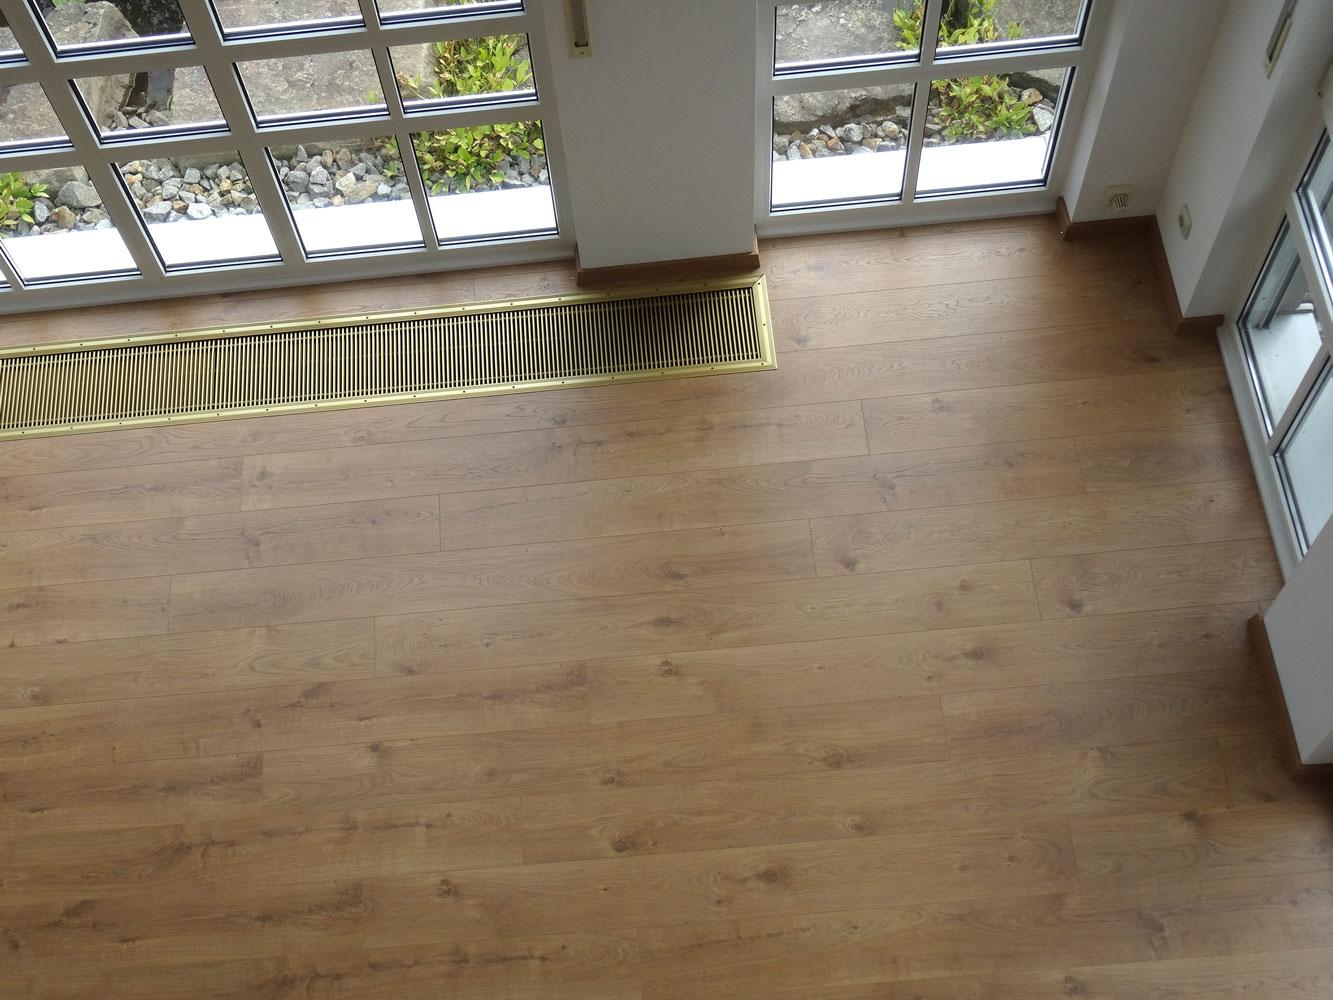 Vinyl Platten Fußboden ~ Laminat vinyl bioböden » projekte » berzl fussboden zentrum